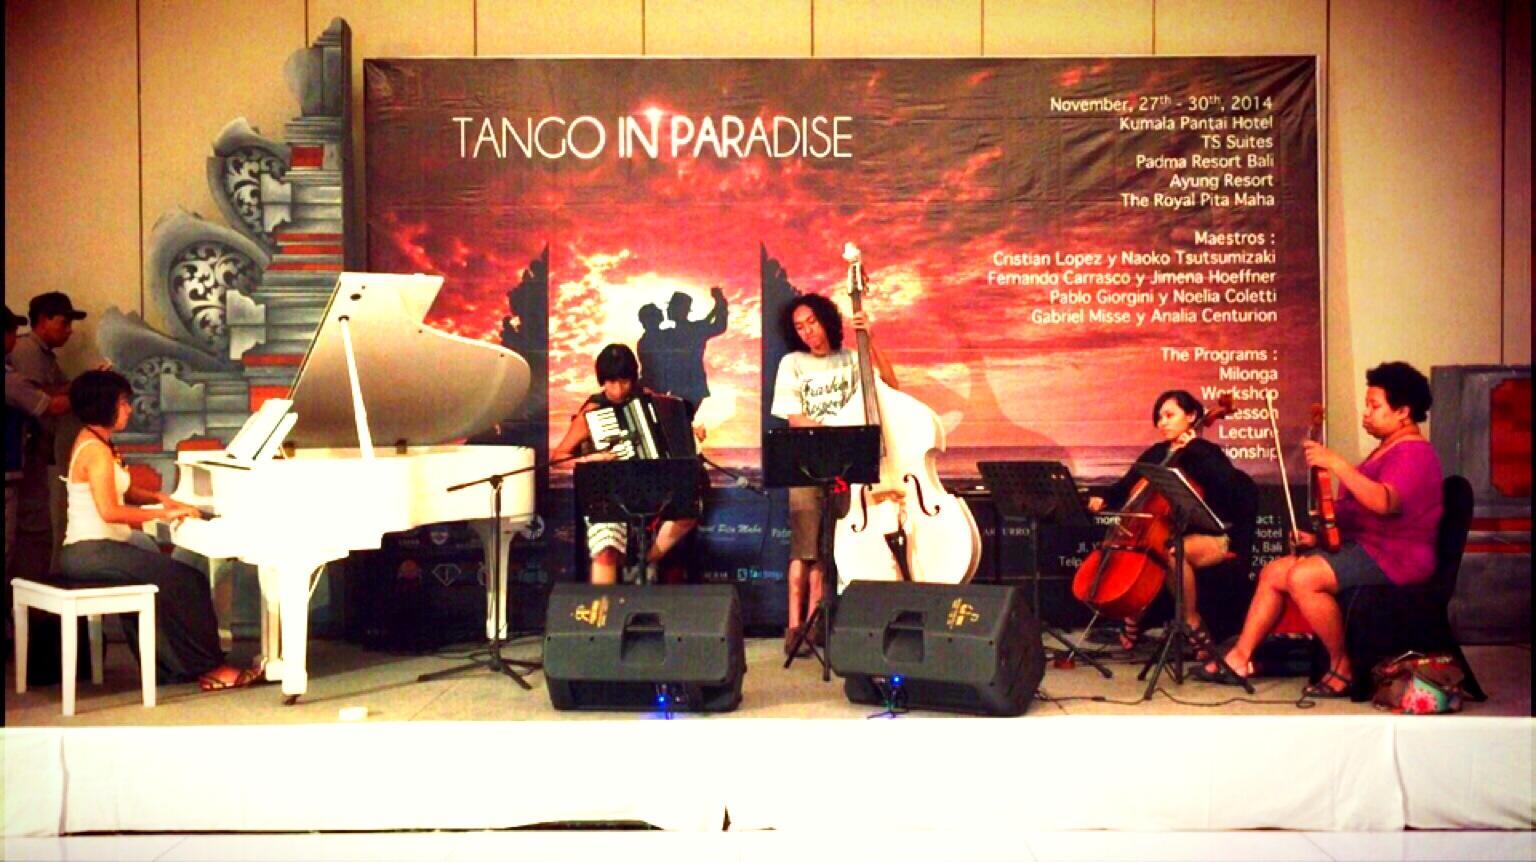 MusiCater Tango Ensemble for Bali Tango in Paradise 2014